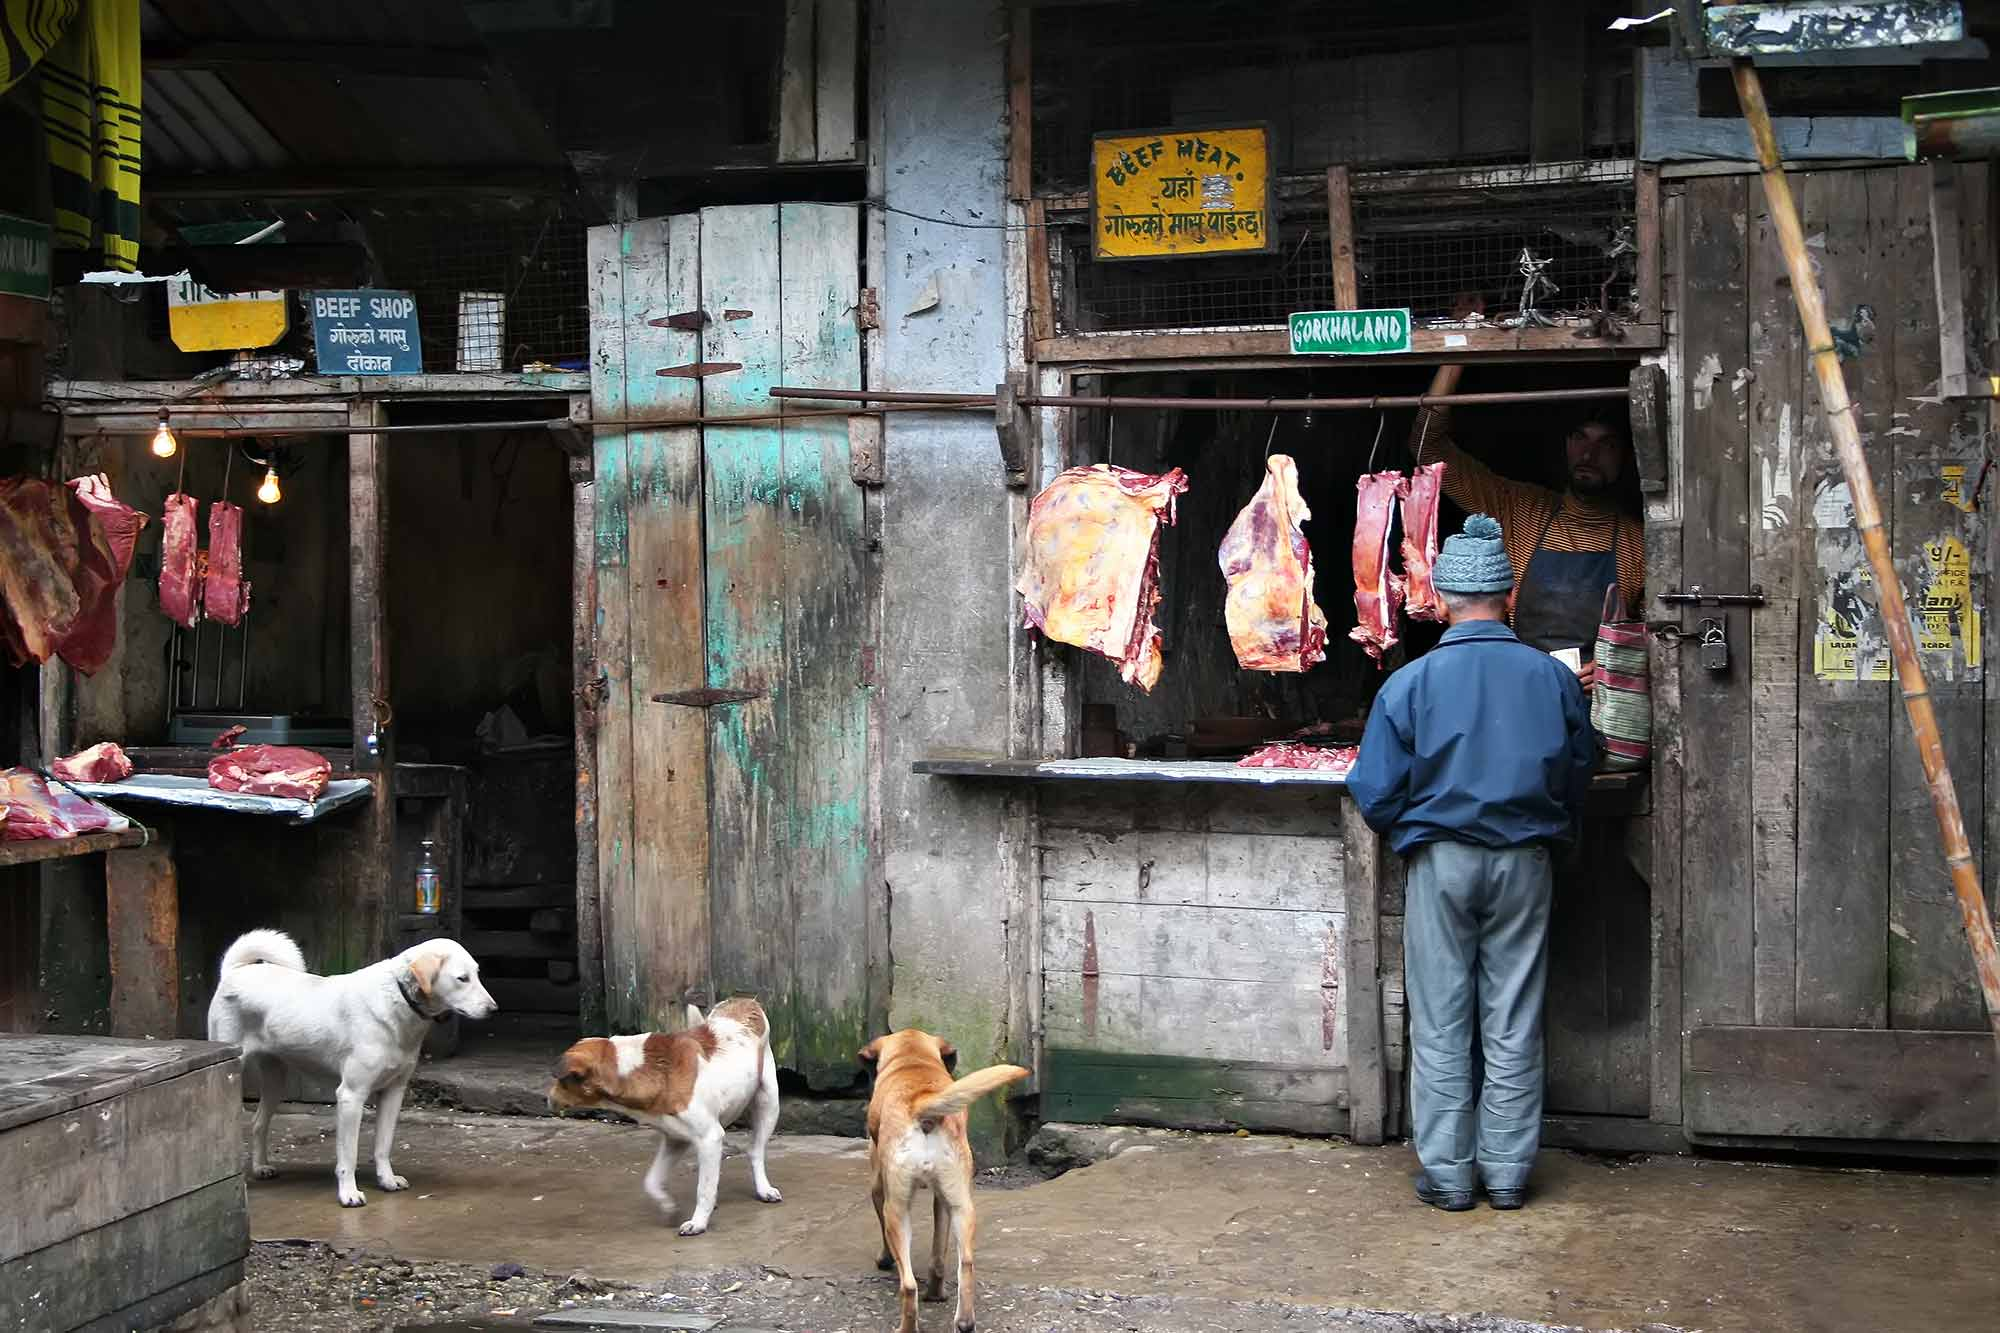 A beef shop in Darjeeling, India. © Ulli Maier & Nisa Maier